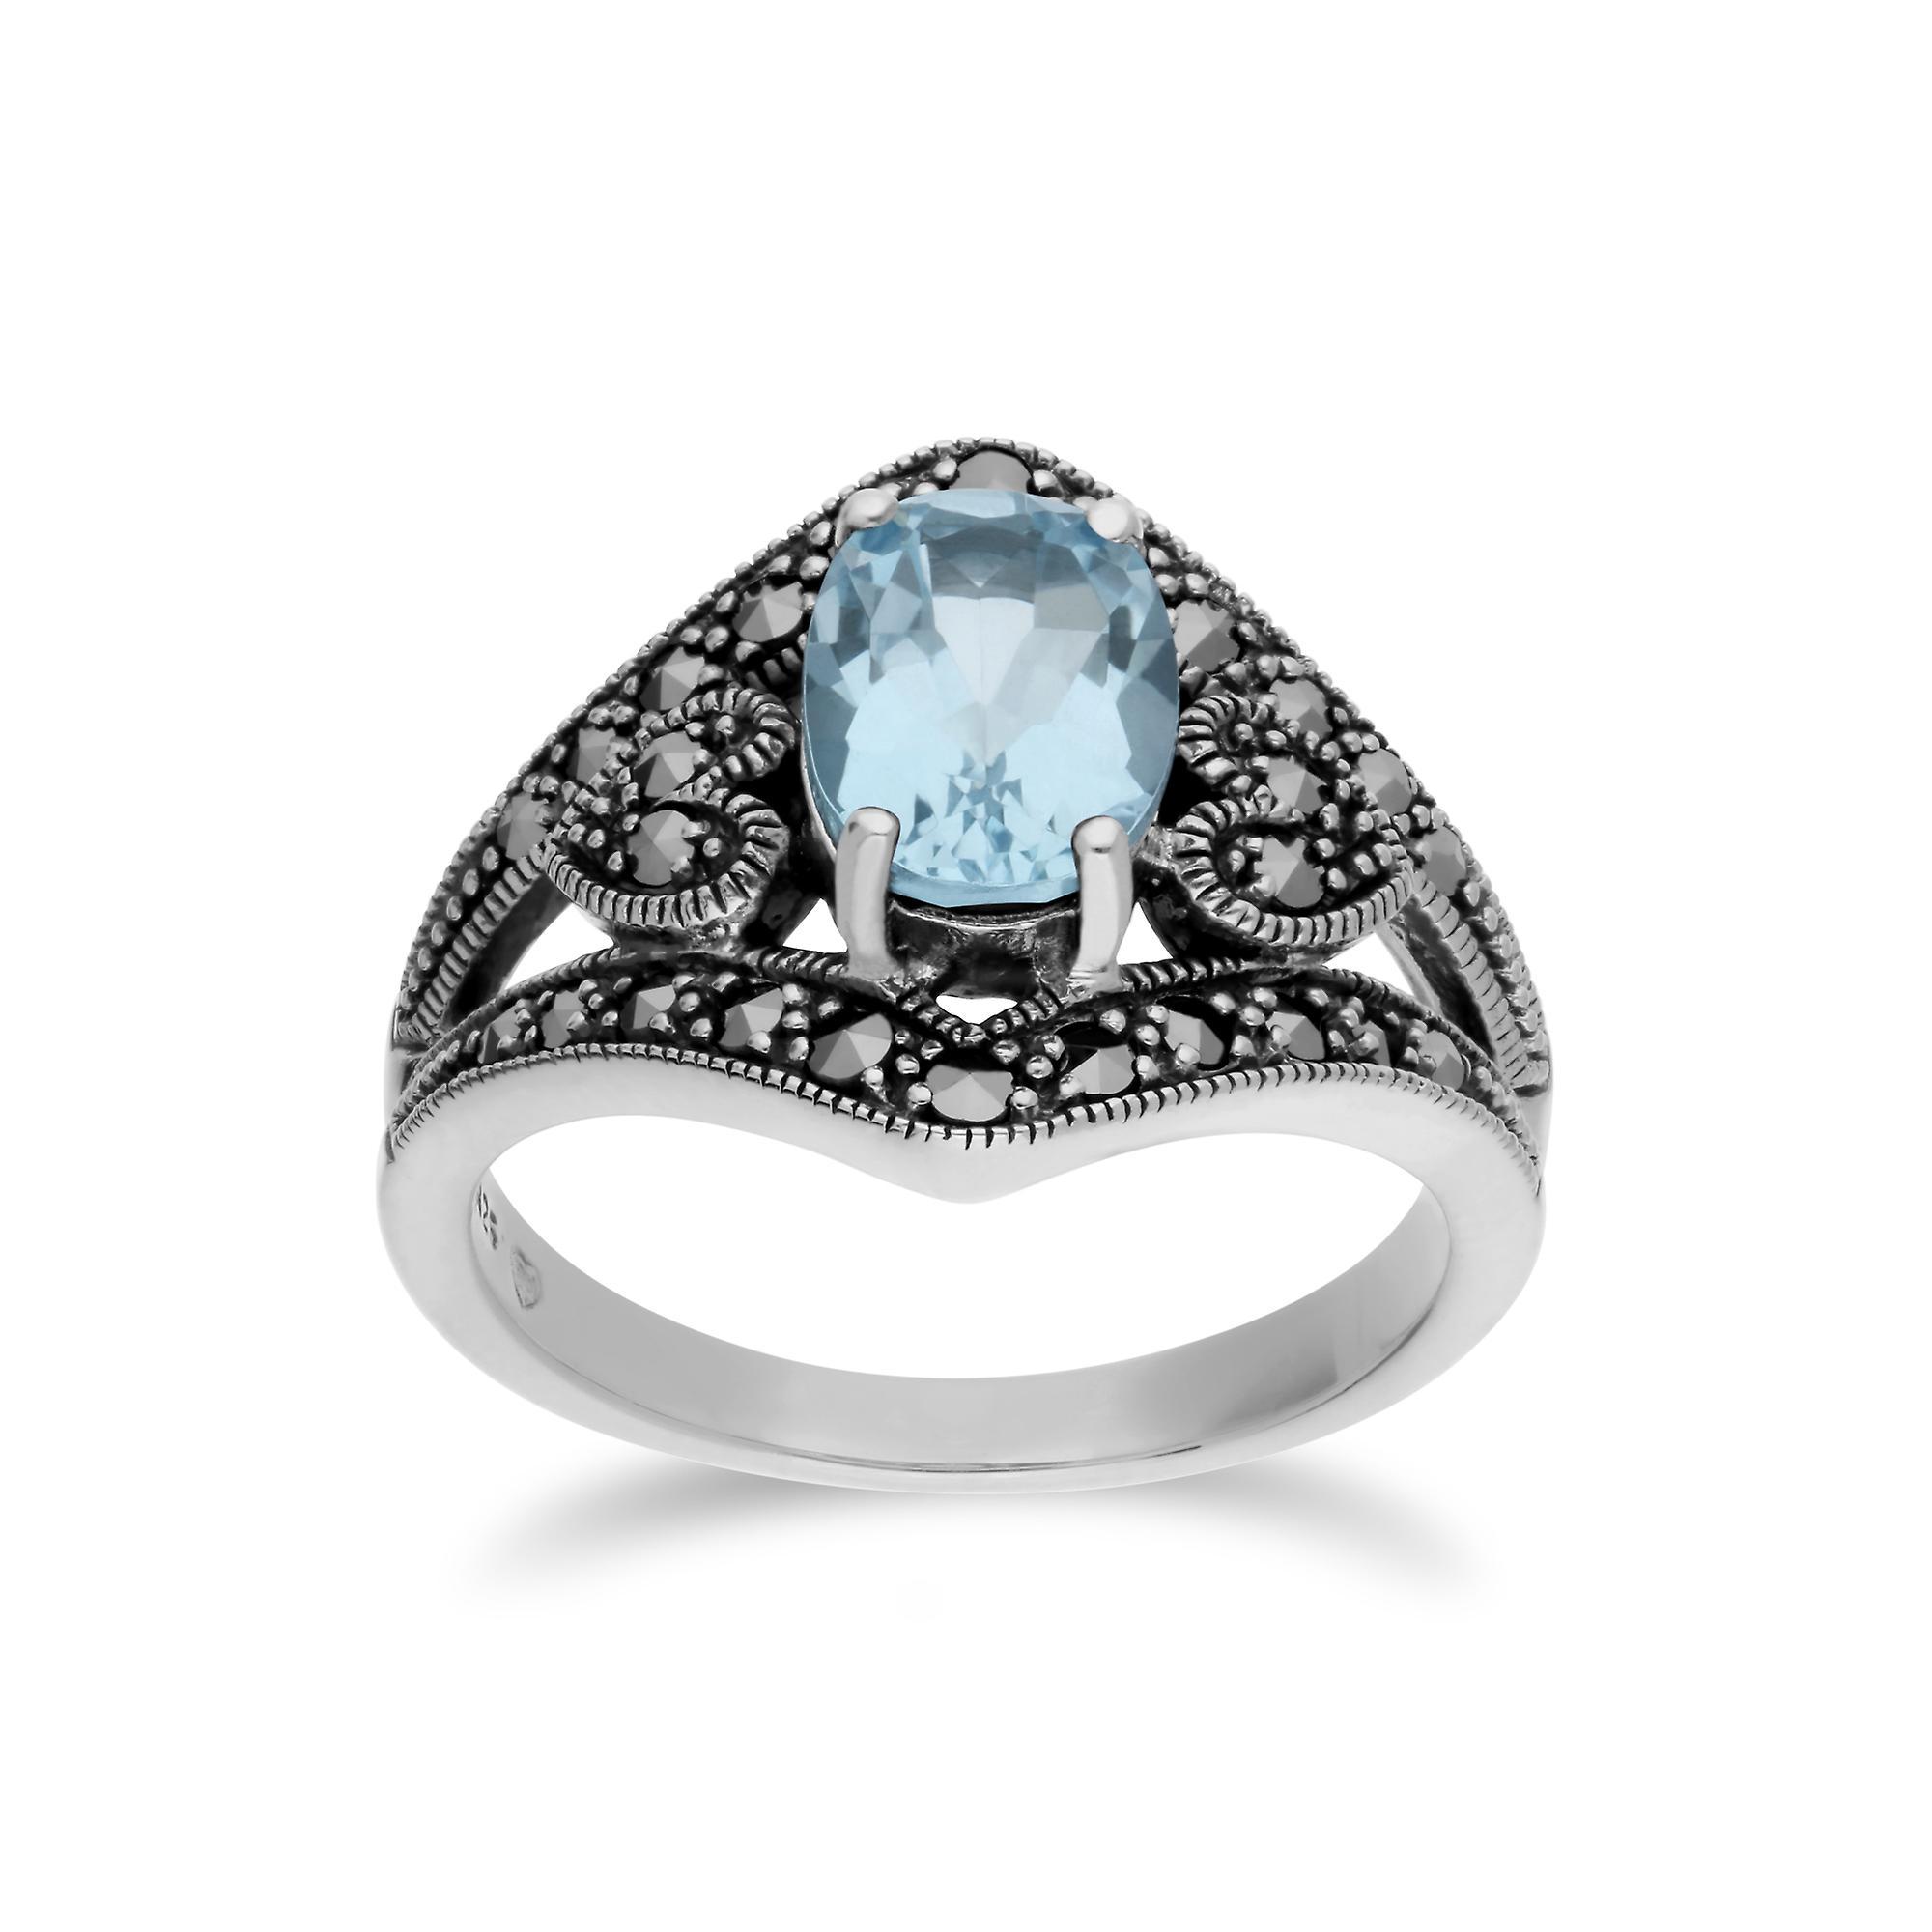 Gemondo Sterling Silver Blue Topaz & Marcasite Oval Art Nouveau Ring